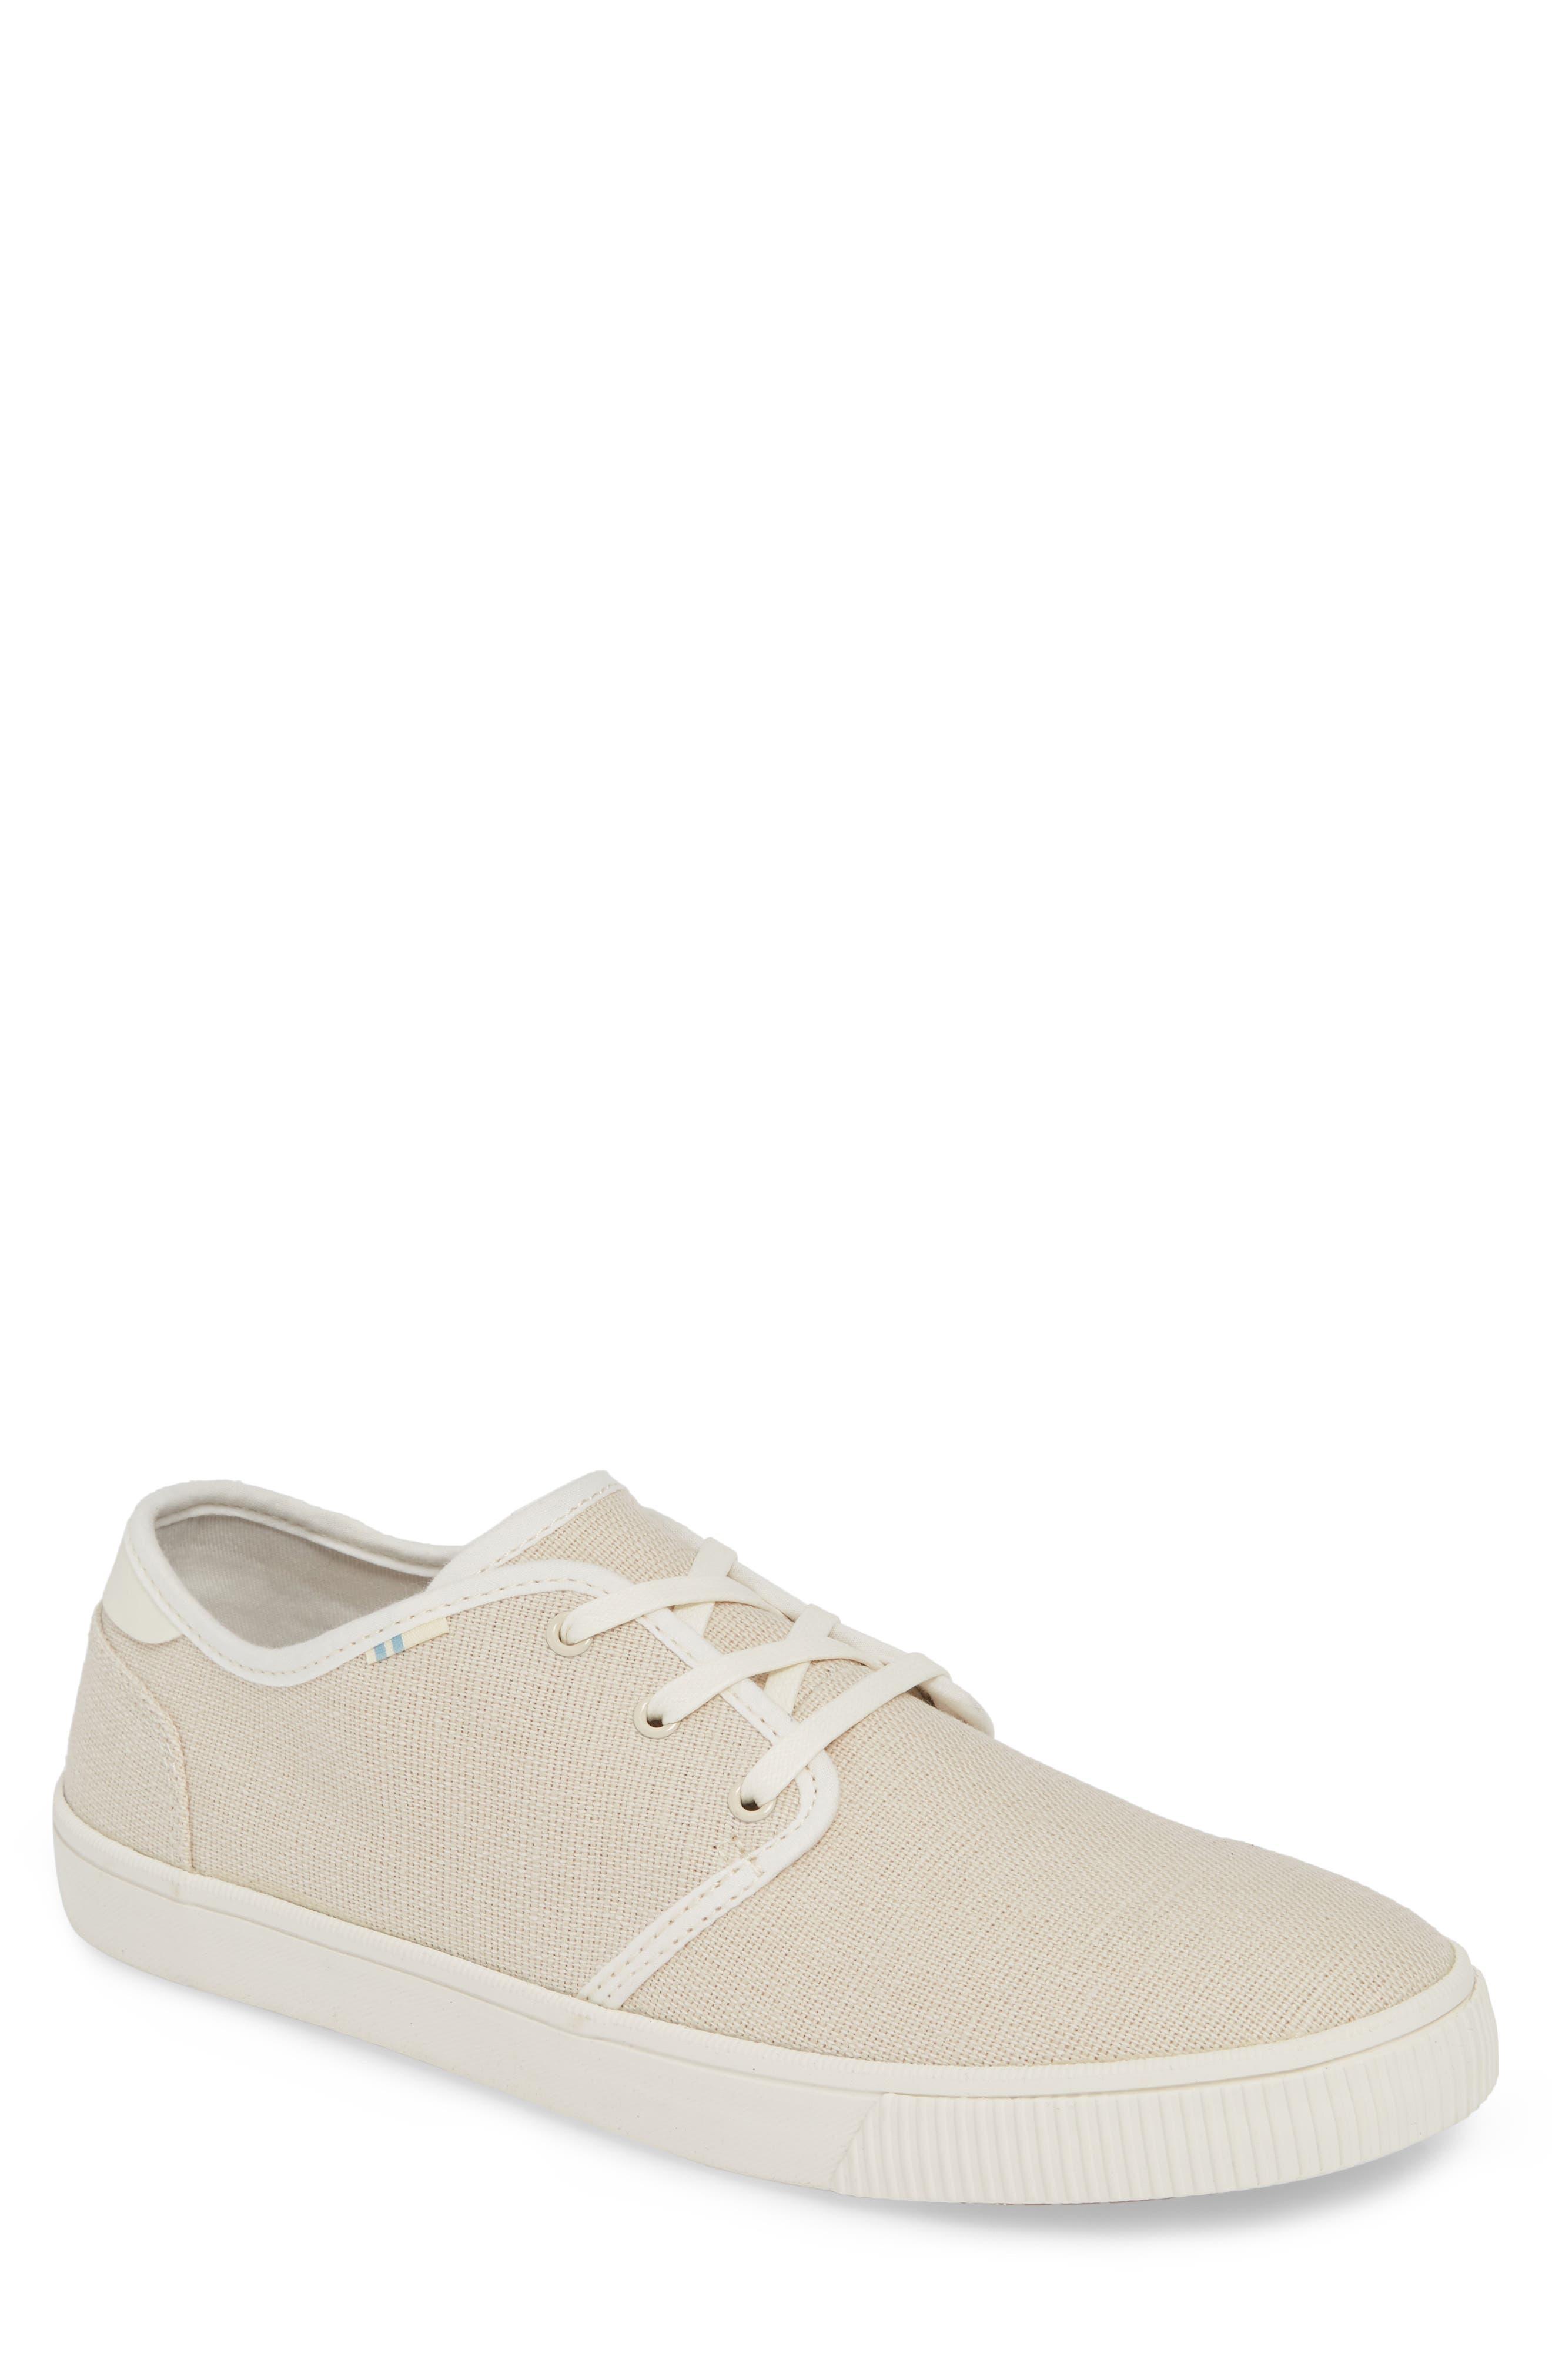 Toms Carlo Low Top Sneaker, White